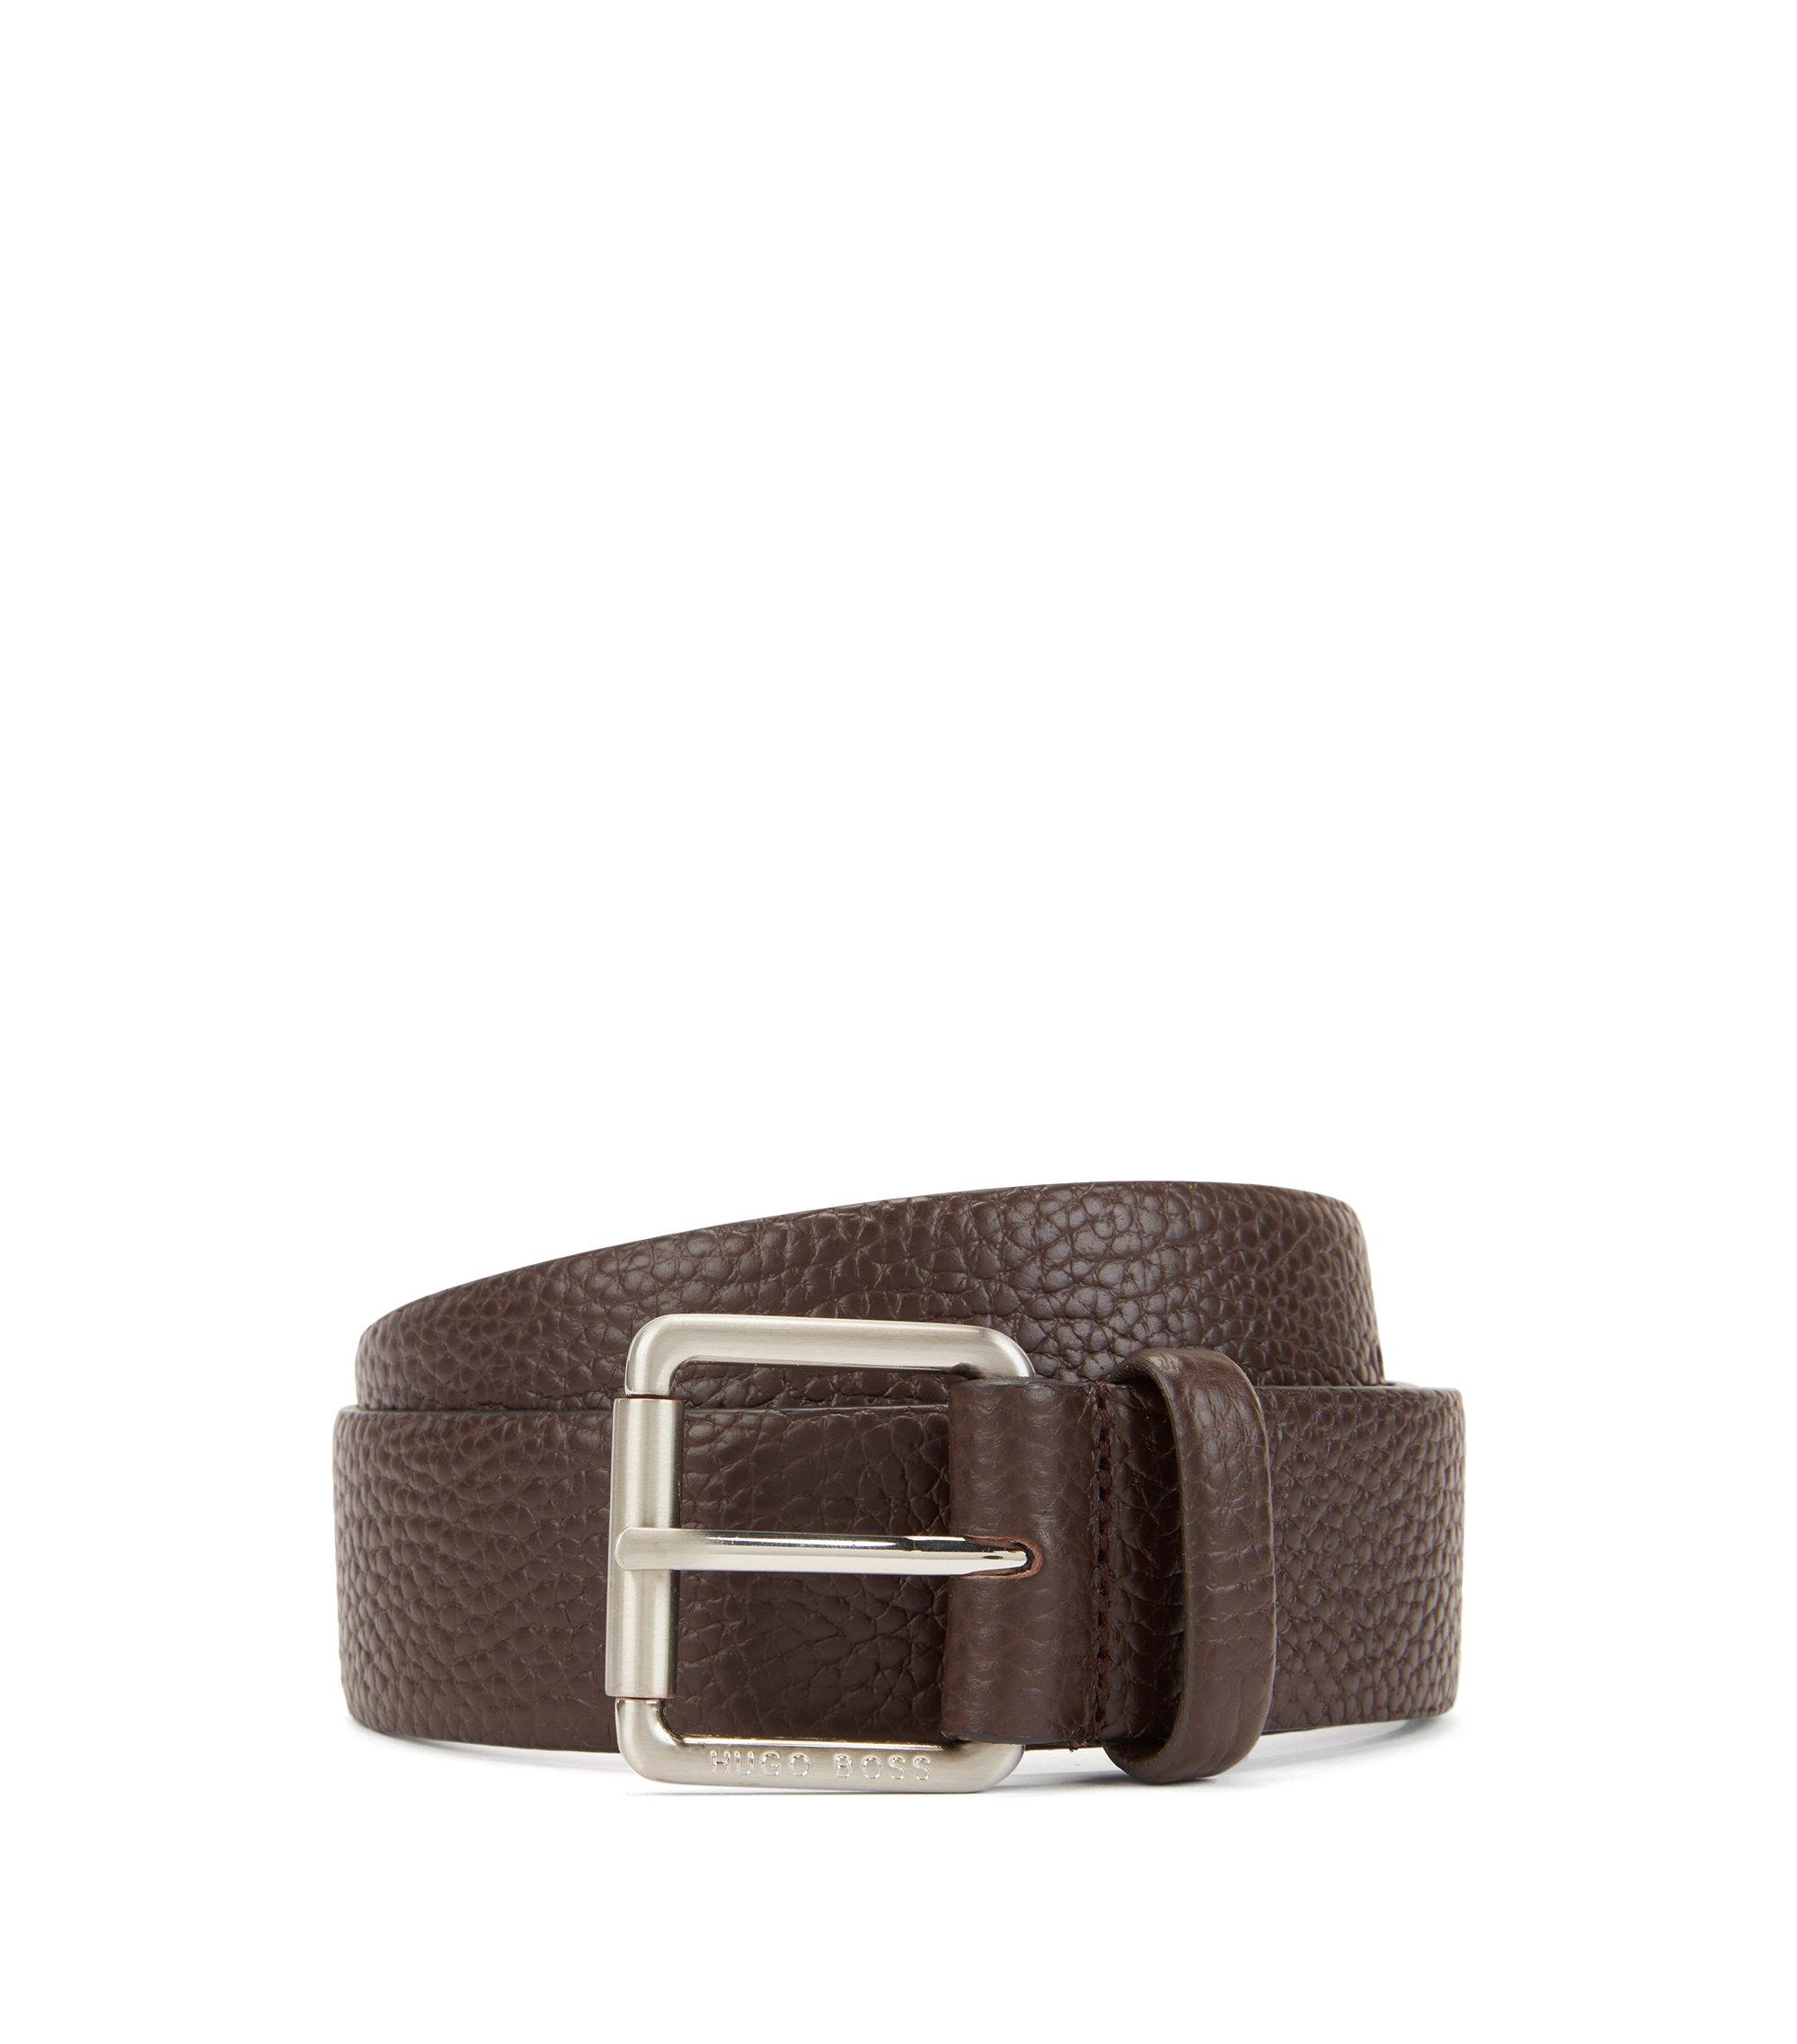 Roller-buckle belt in natural-grain leather, Dark Brown